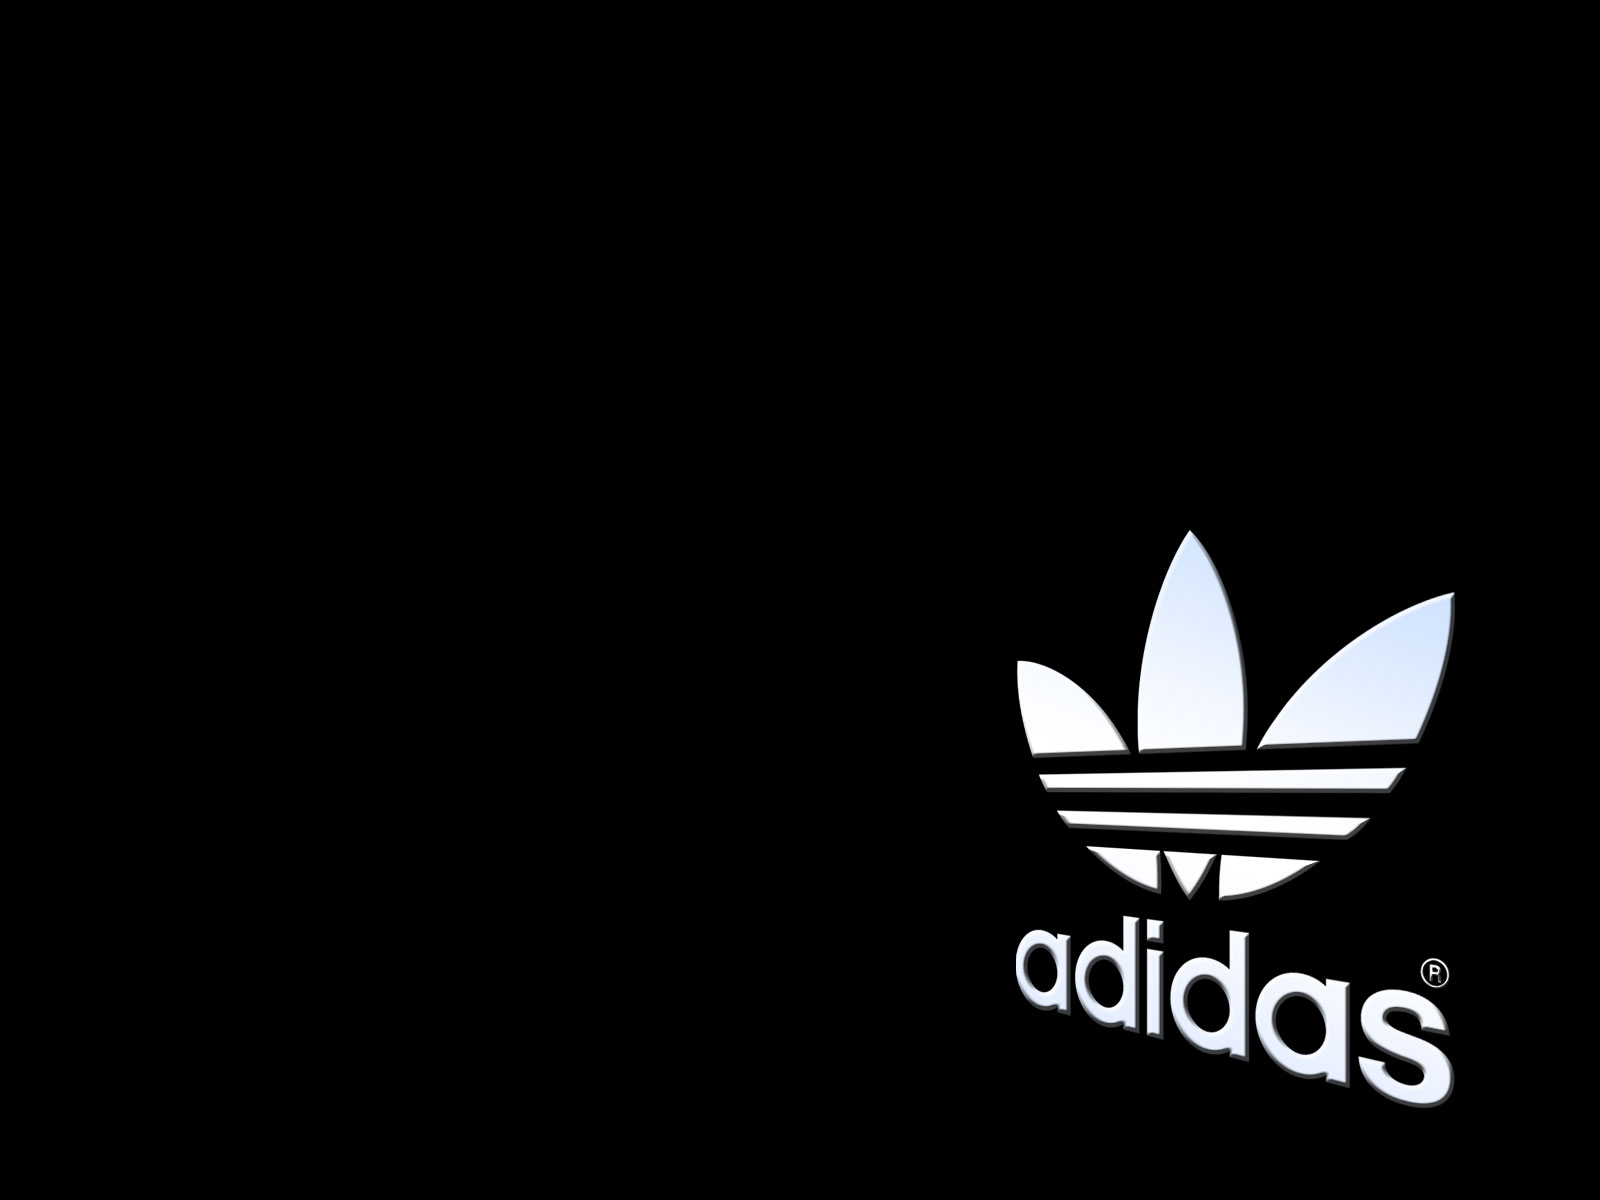 Adidas Logo Wallpaper Desktop Images amp Pictures   Becuo 1600x1200